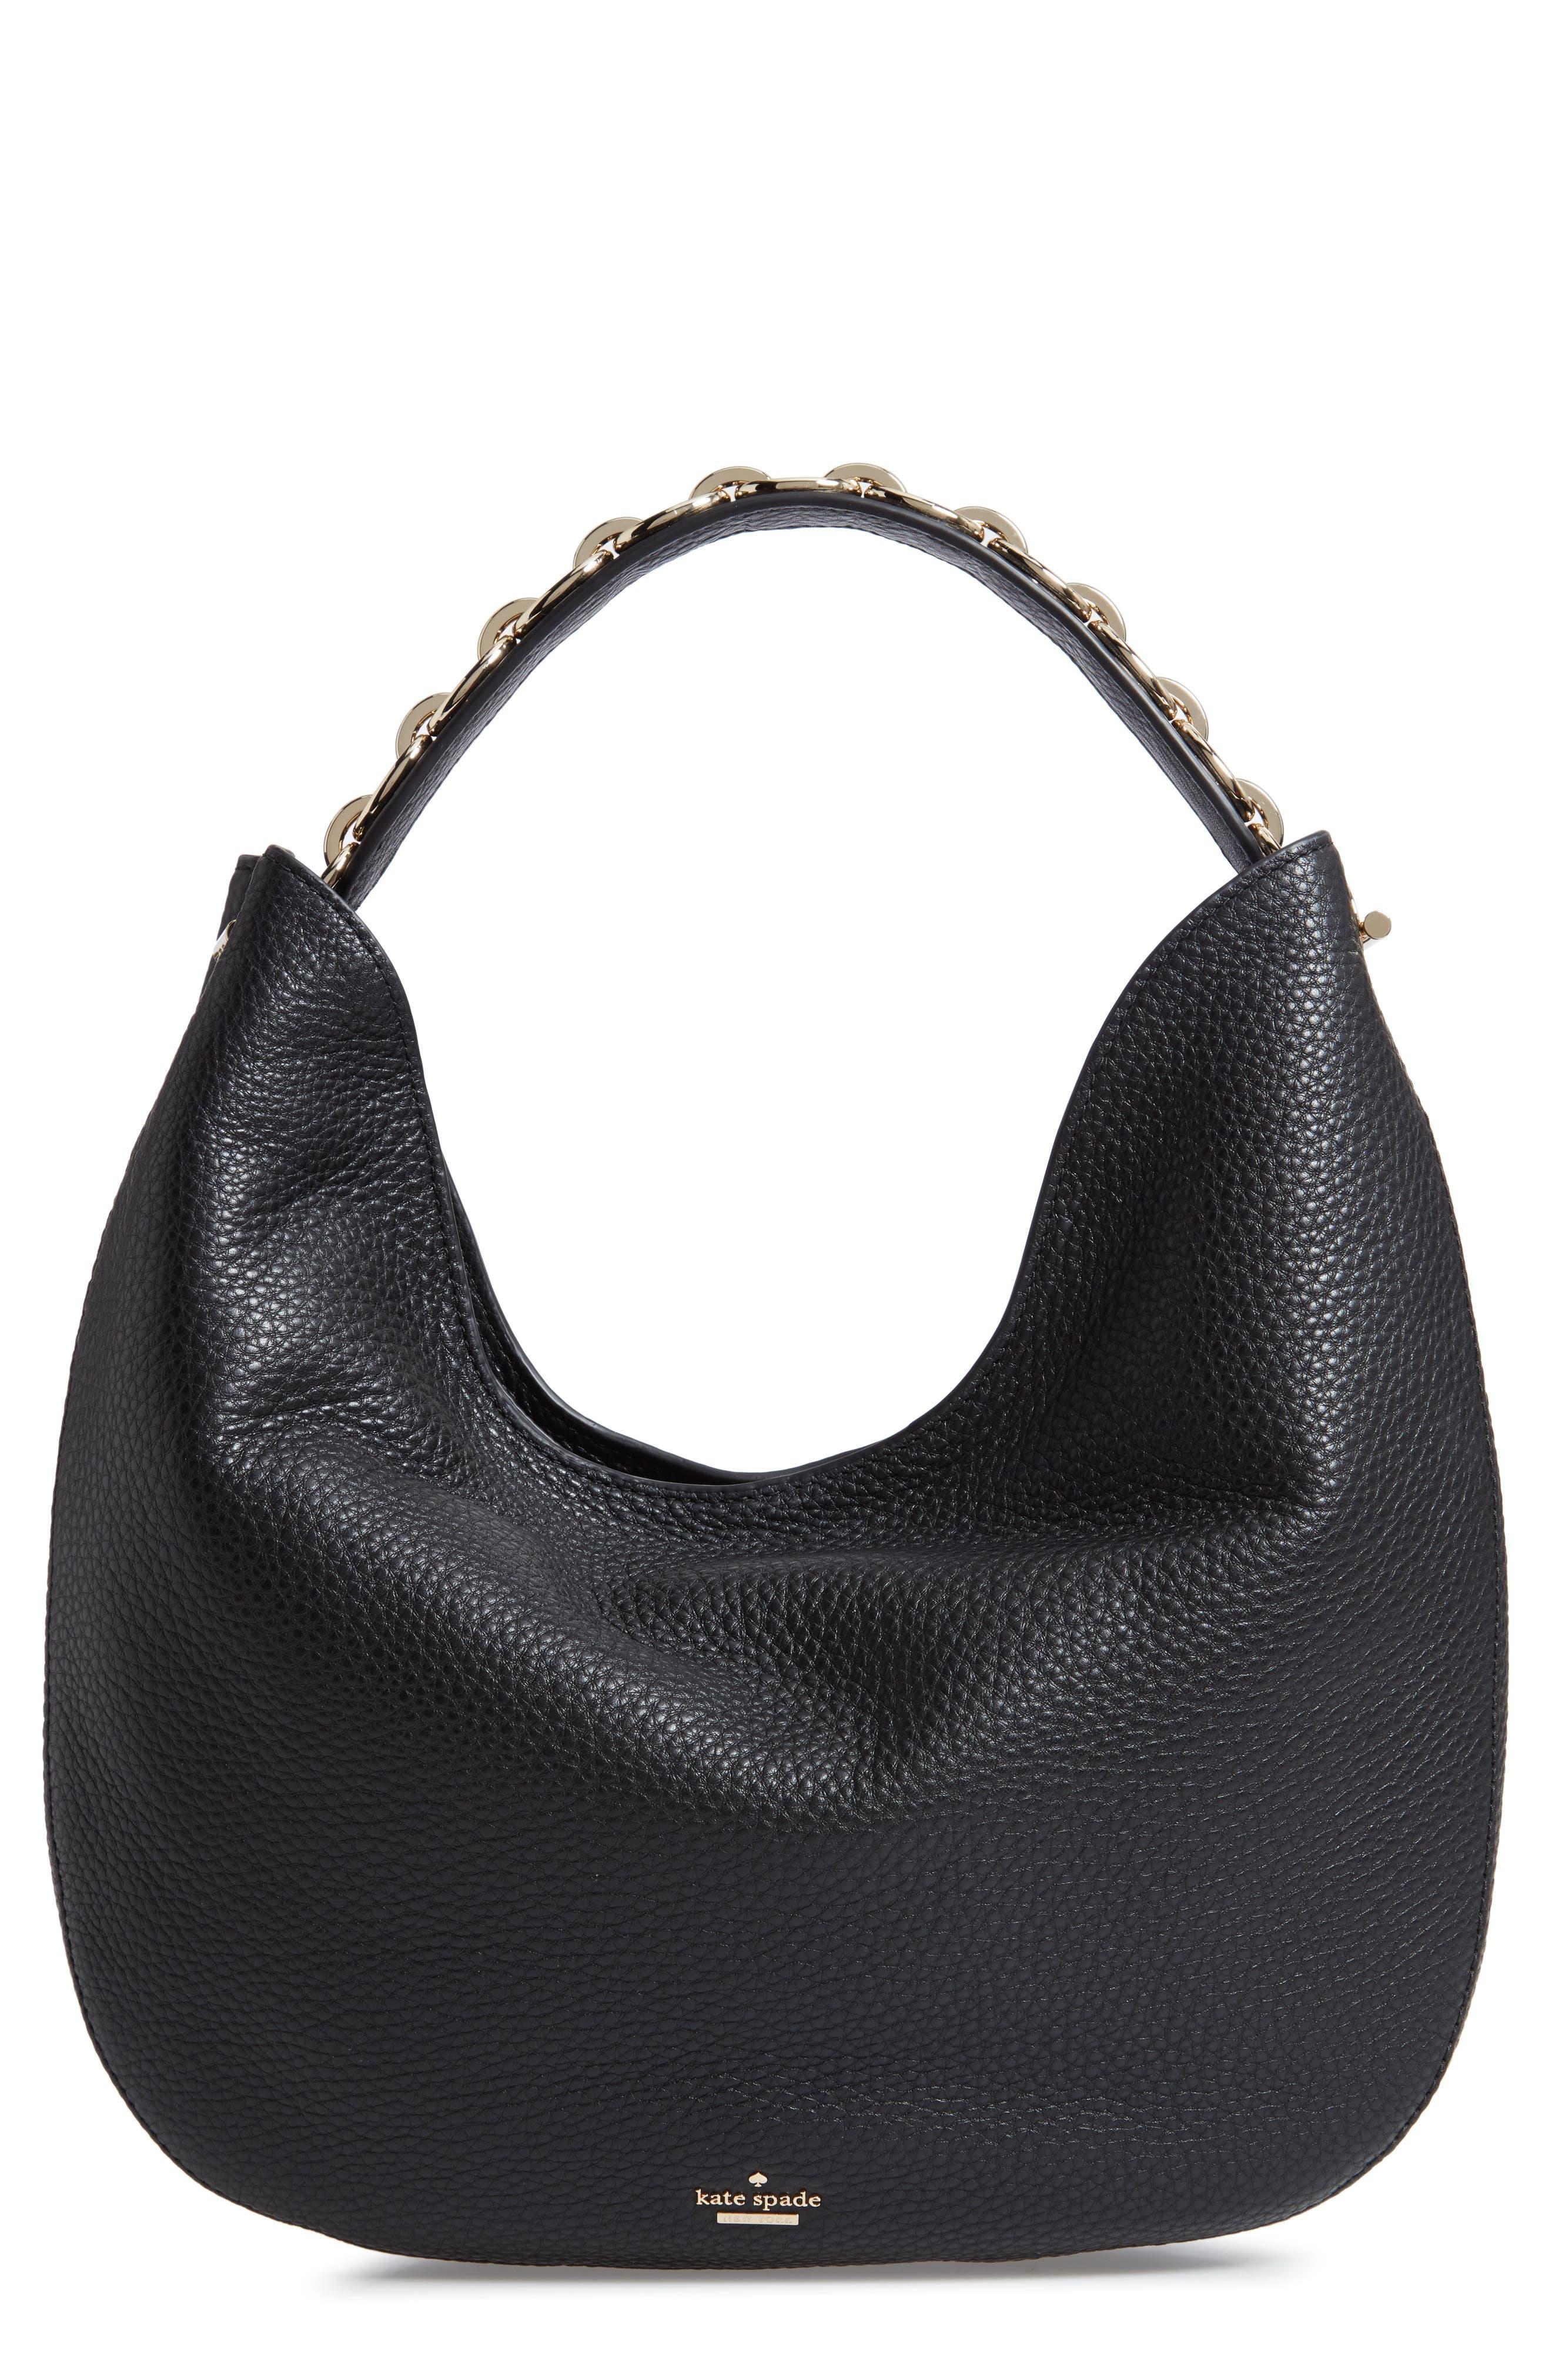 murray street heather pebbled leather hobo bag,                         Main,                         color, BLACK